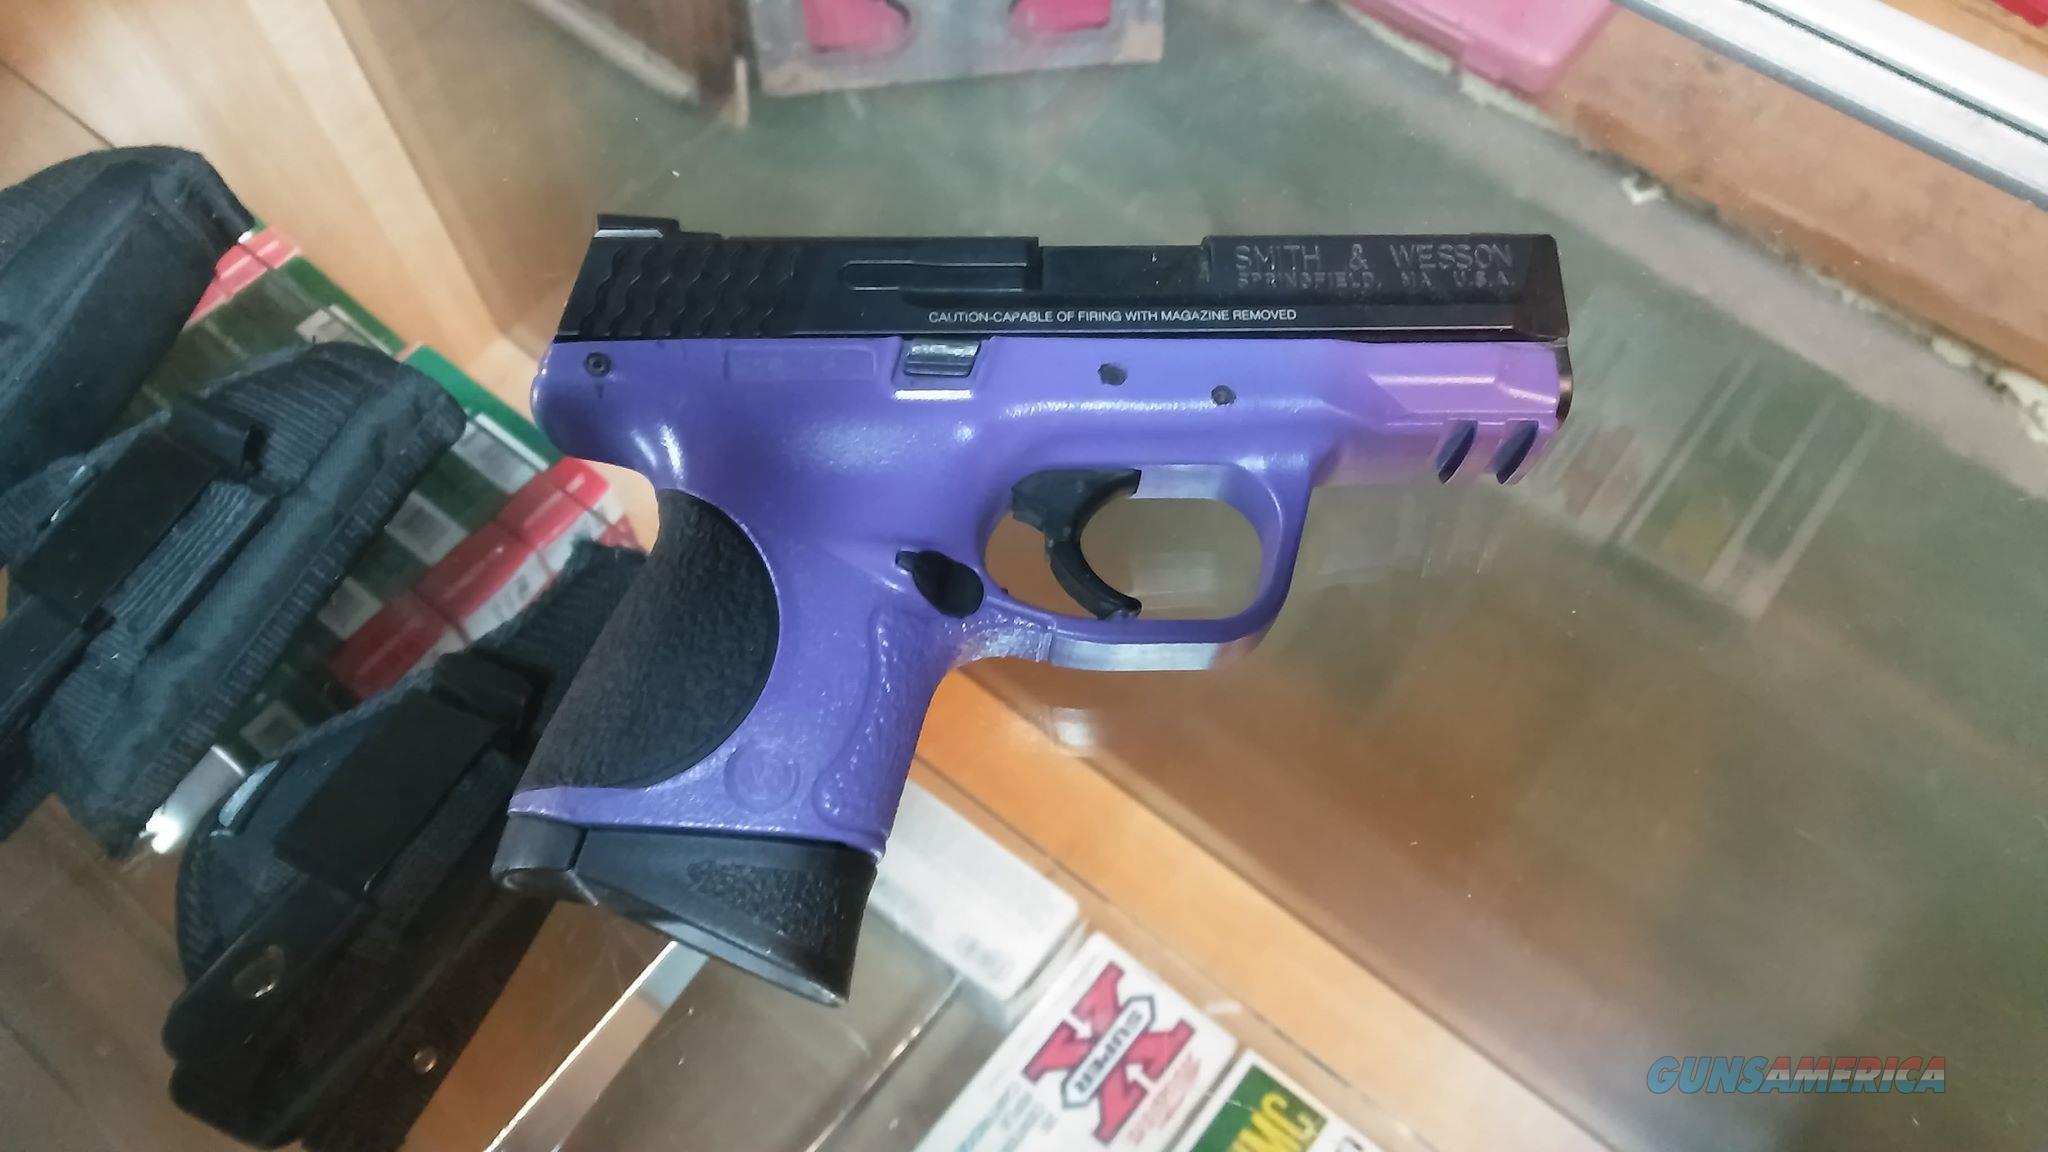 Smith & Wesson M&P9c  Guns > Pistols > Smith & Wesson Pistols - Autos > Polymer Frame